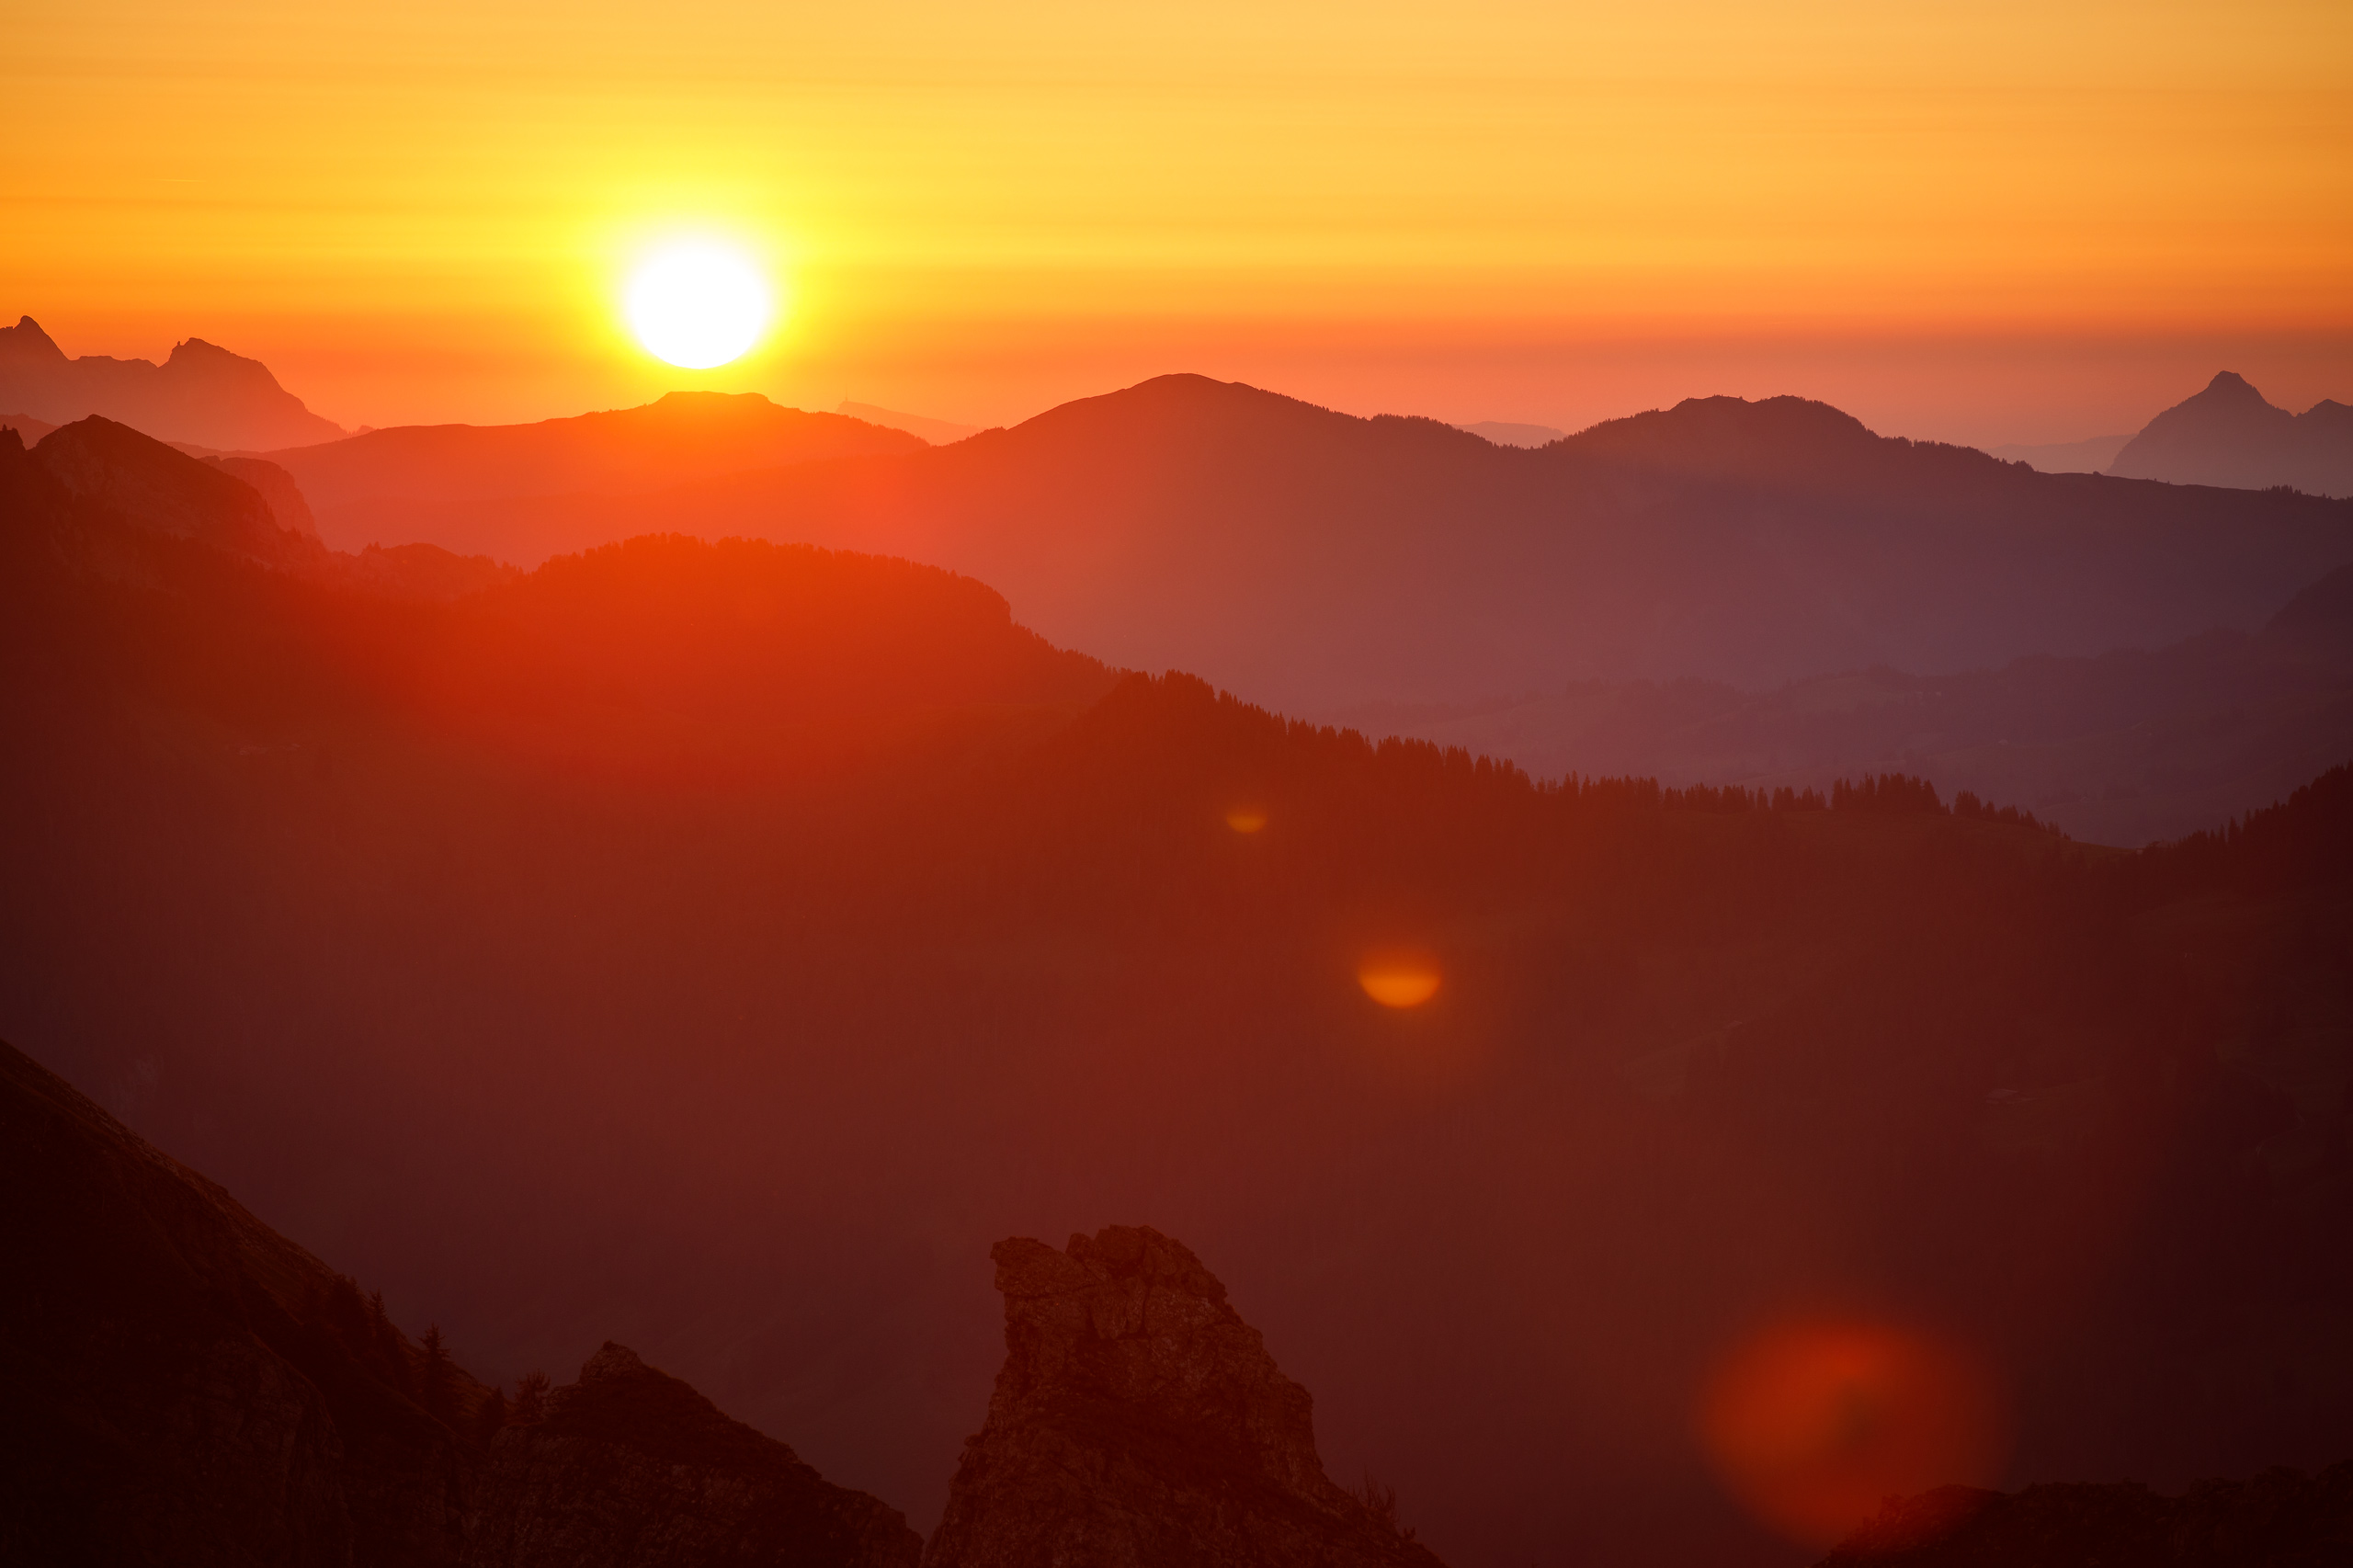 Tom_Schueler_Fotografie_Landschaft_Alpen_Dolomiten_12